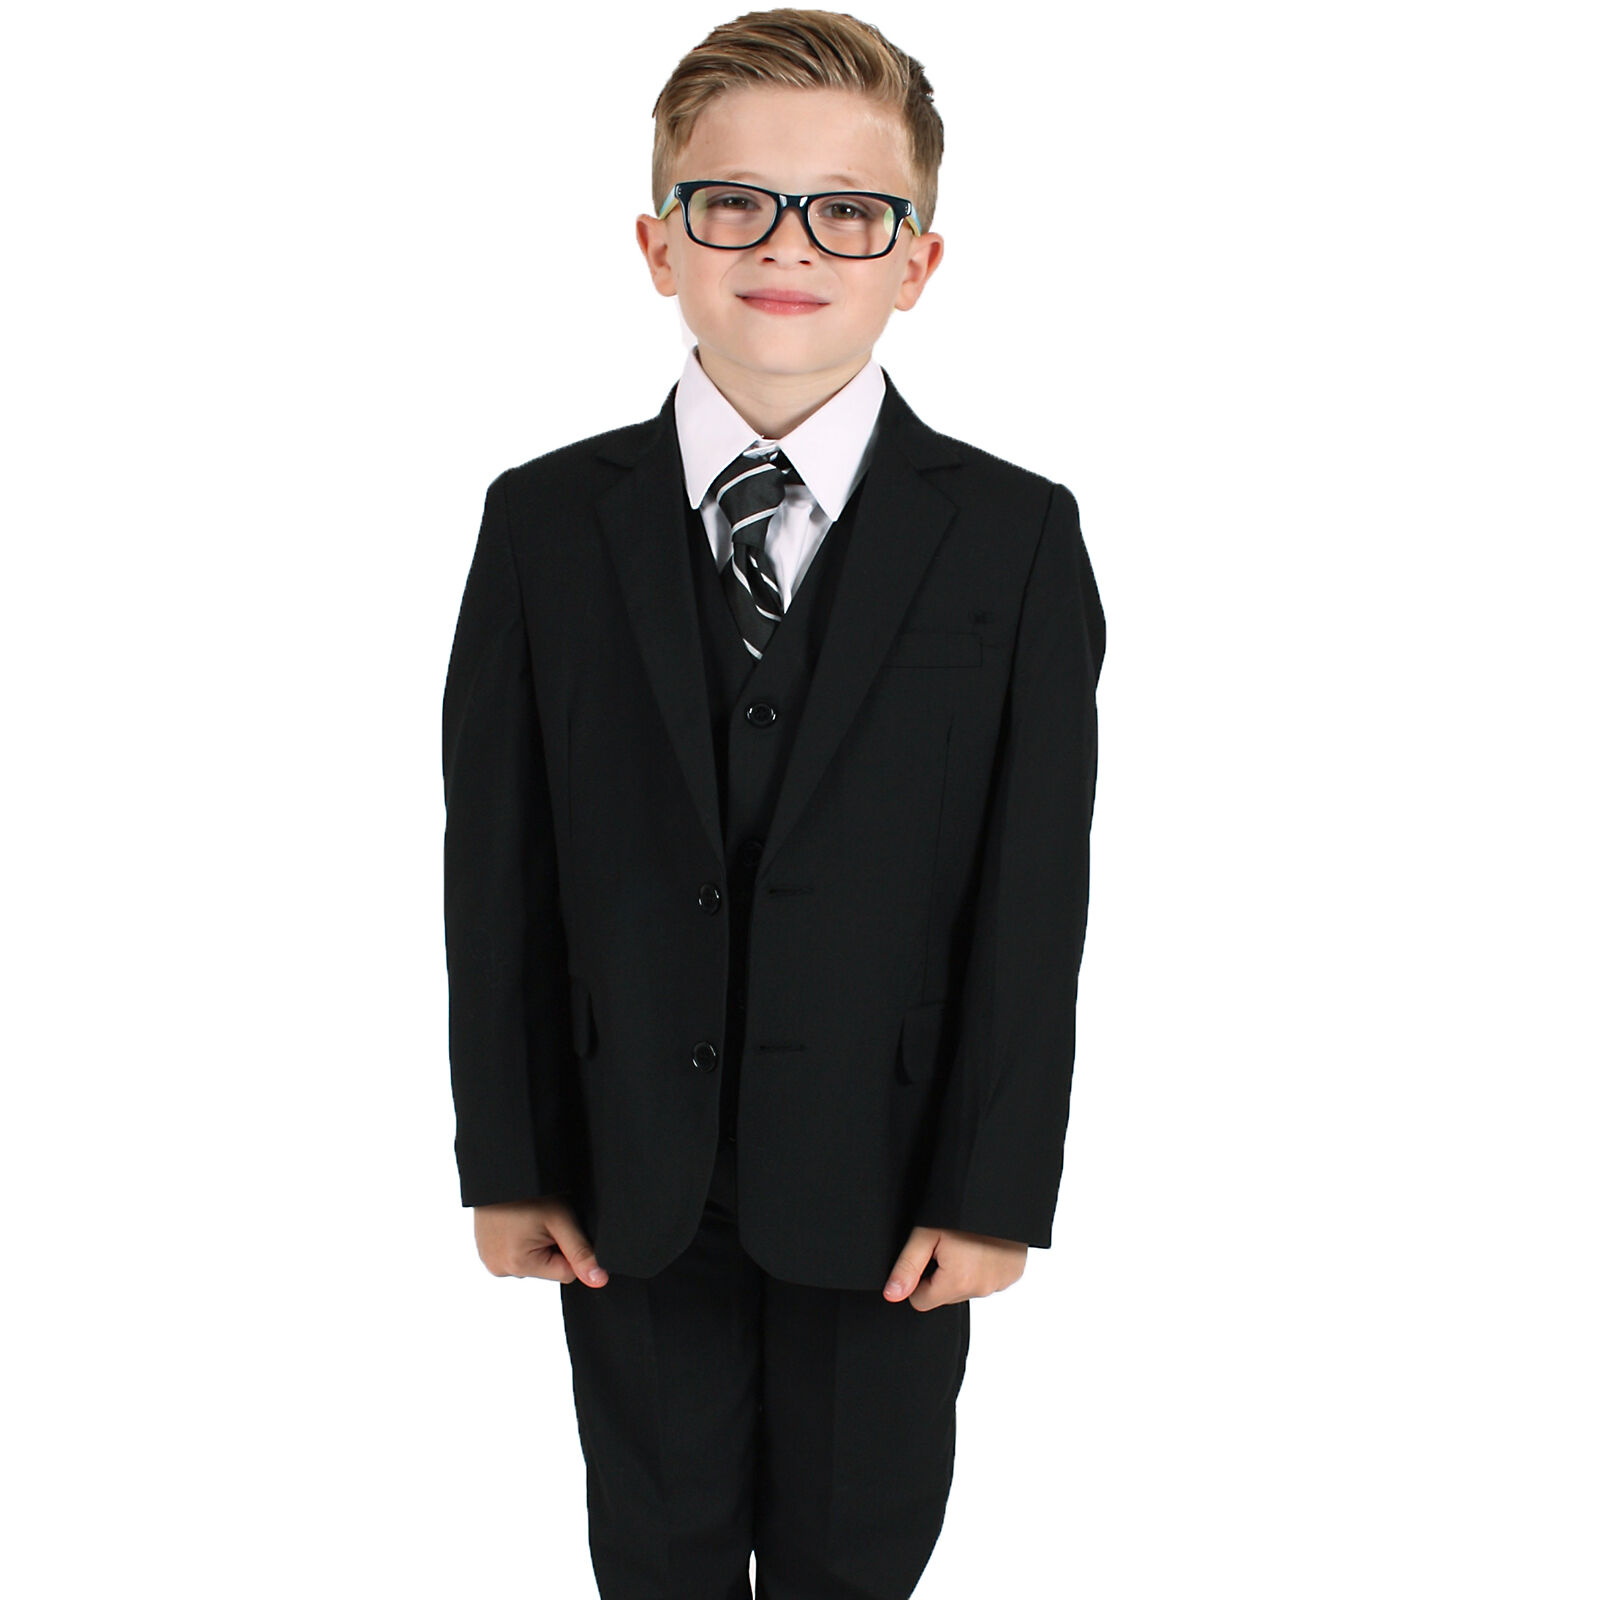 752bdd2f9 Details about Boys Suits Boys Black Suit 5 Piece Slim Fit Wedding Page Boy  Formal Party Outfit